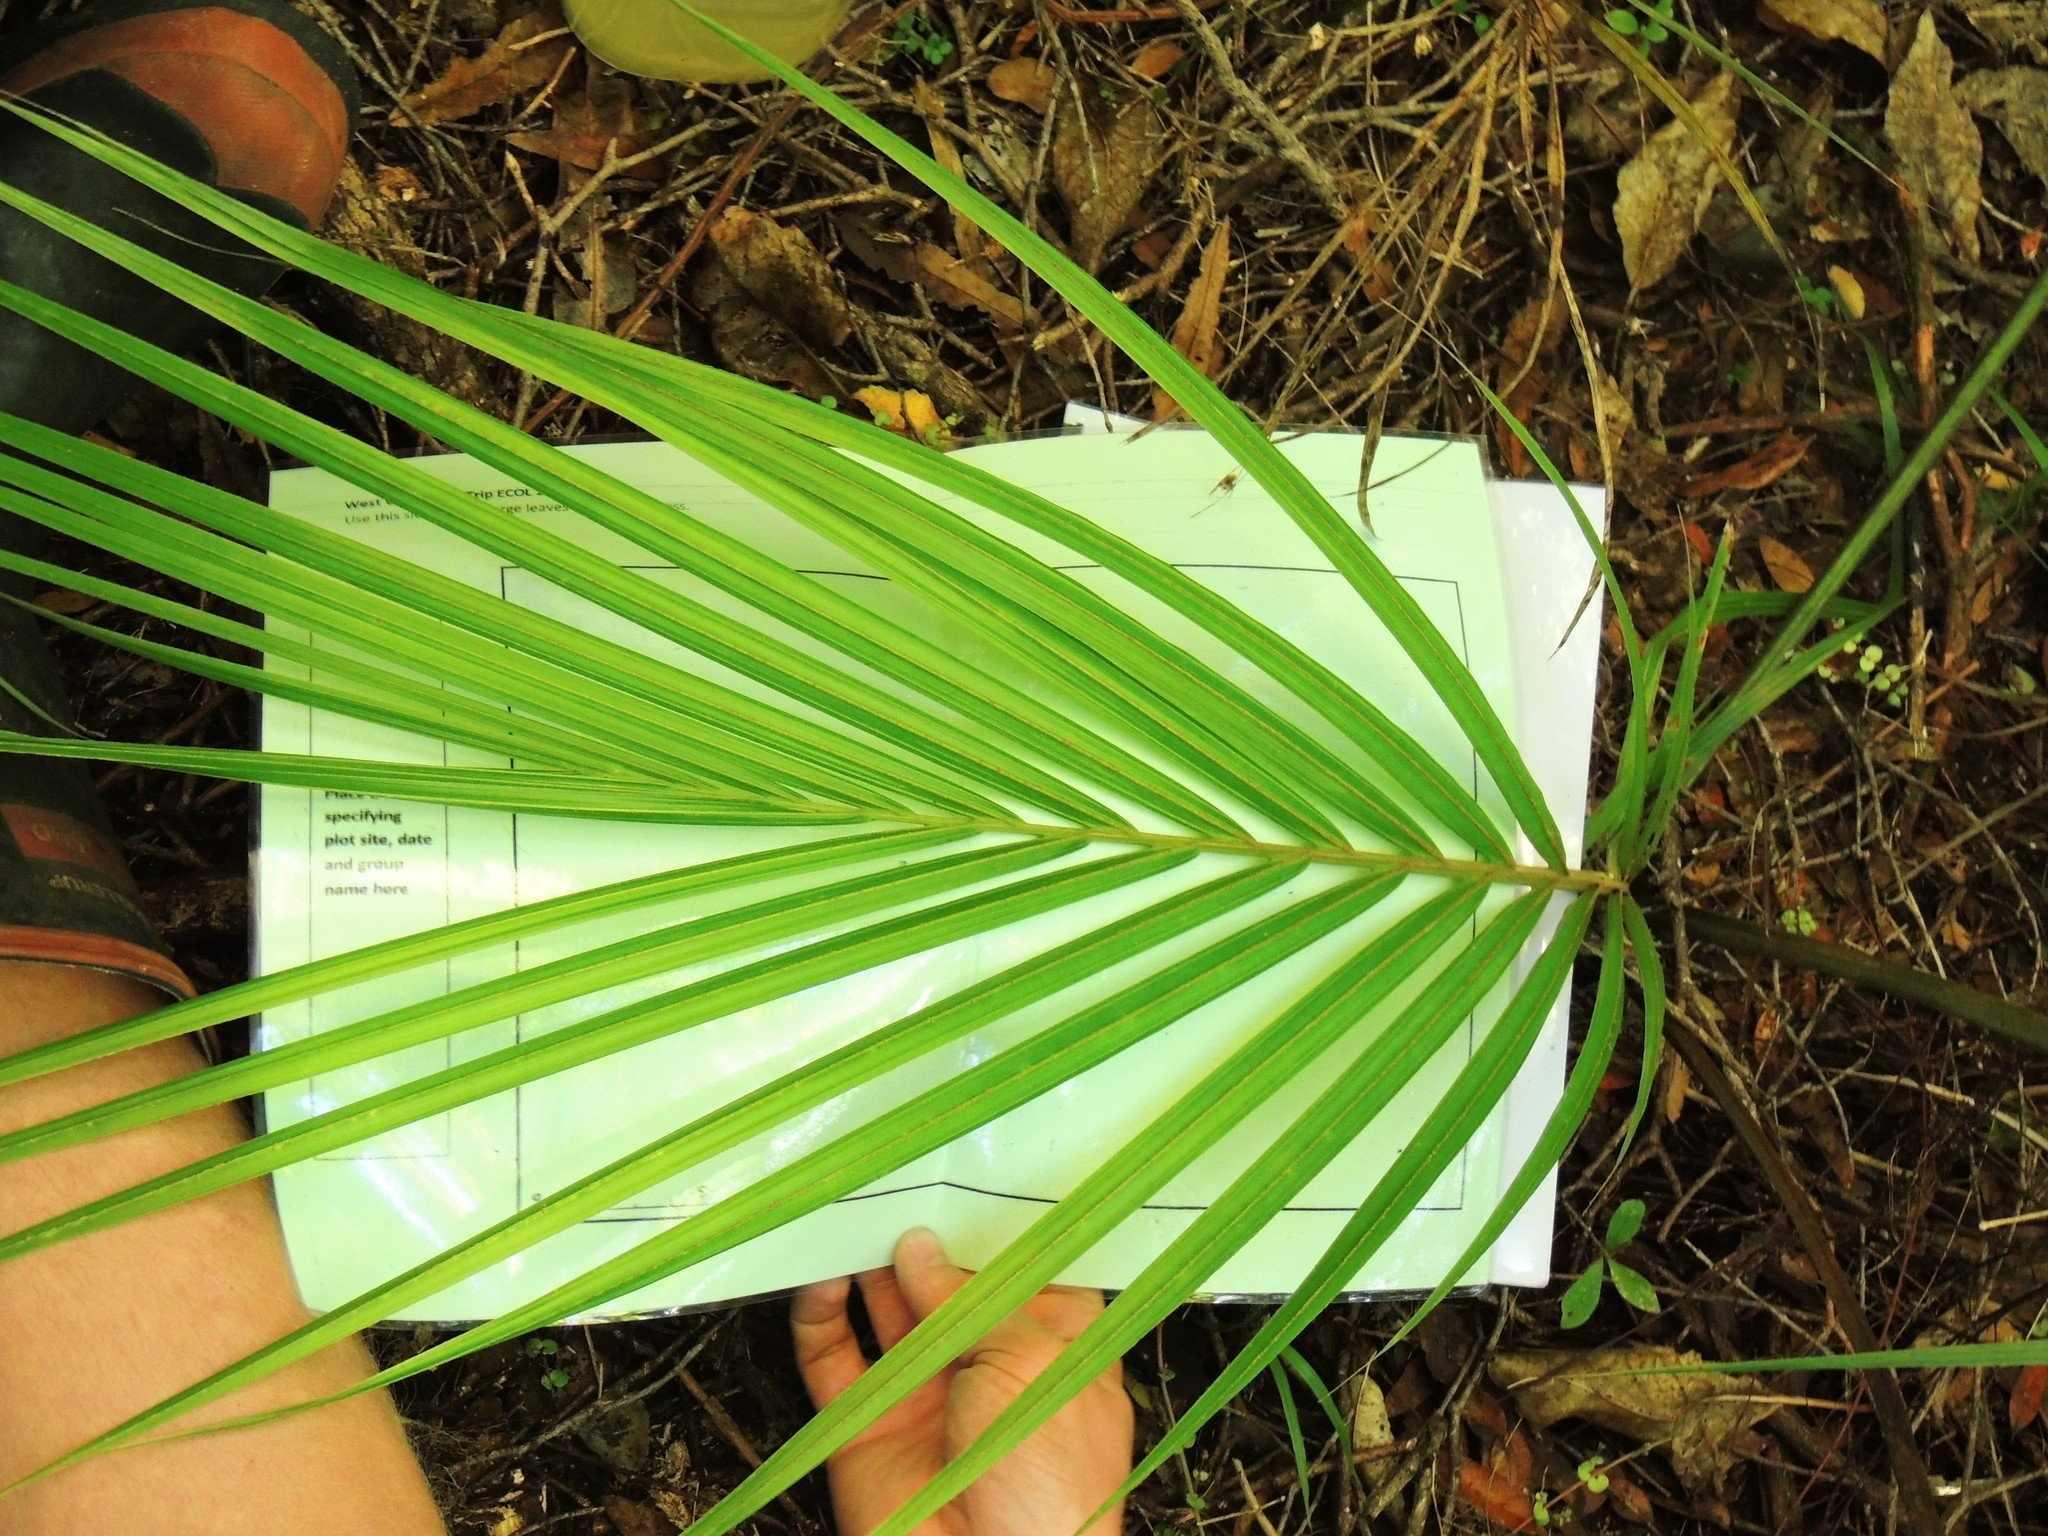 Перистая пальма Ропалостилис